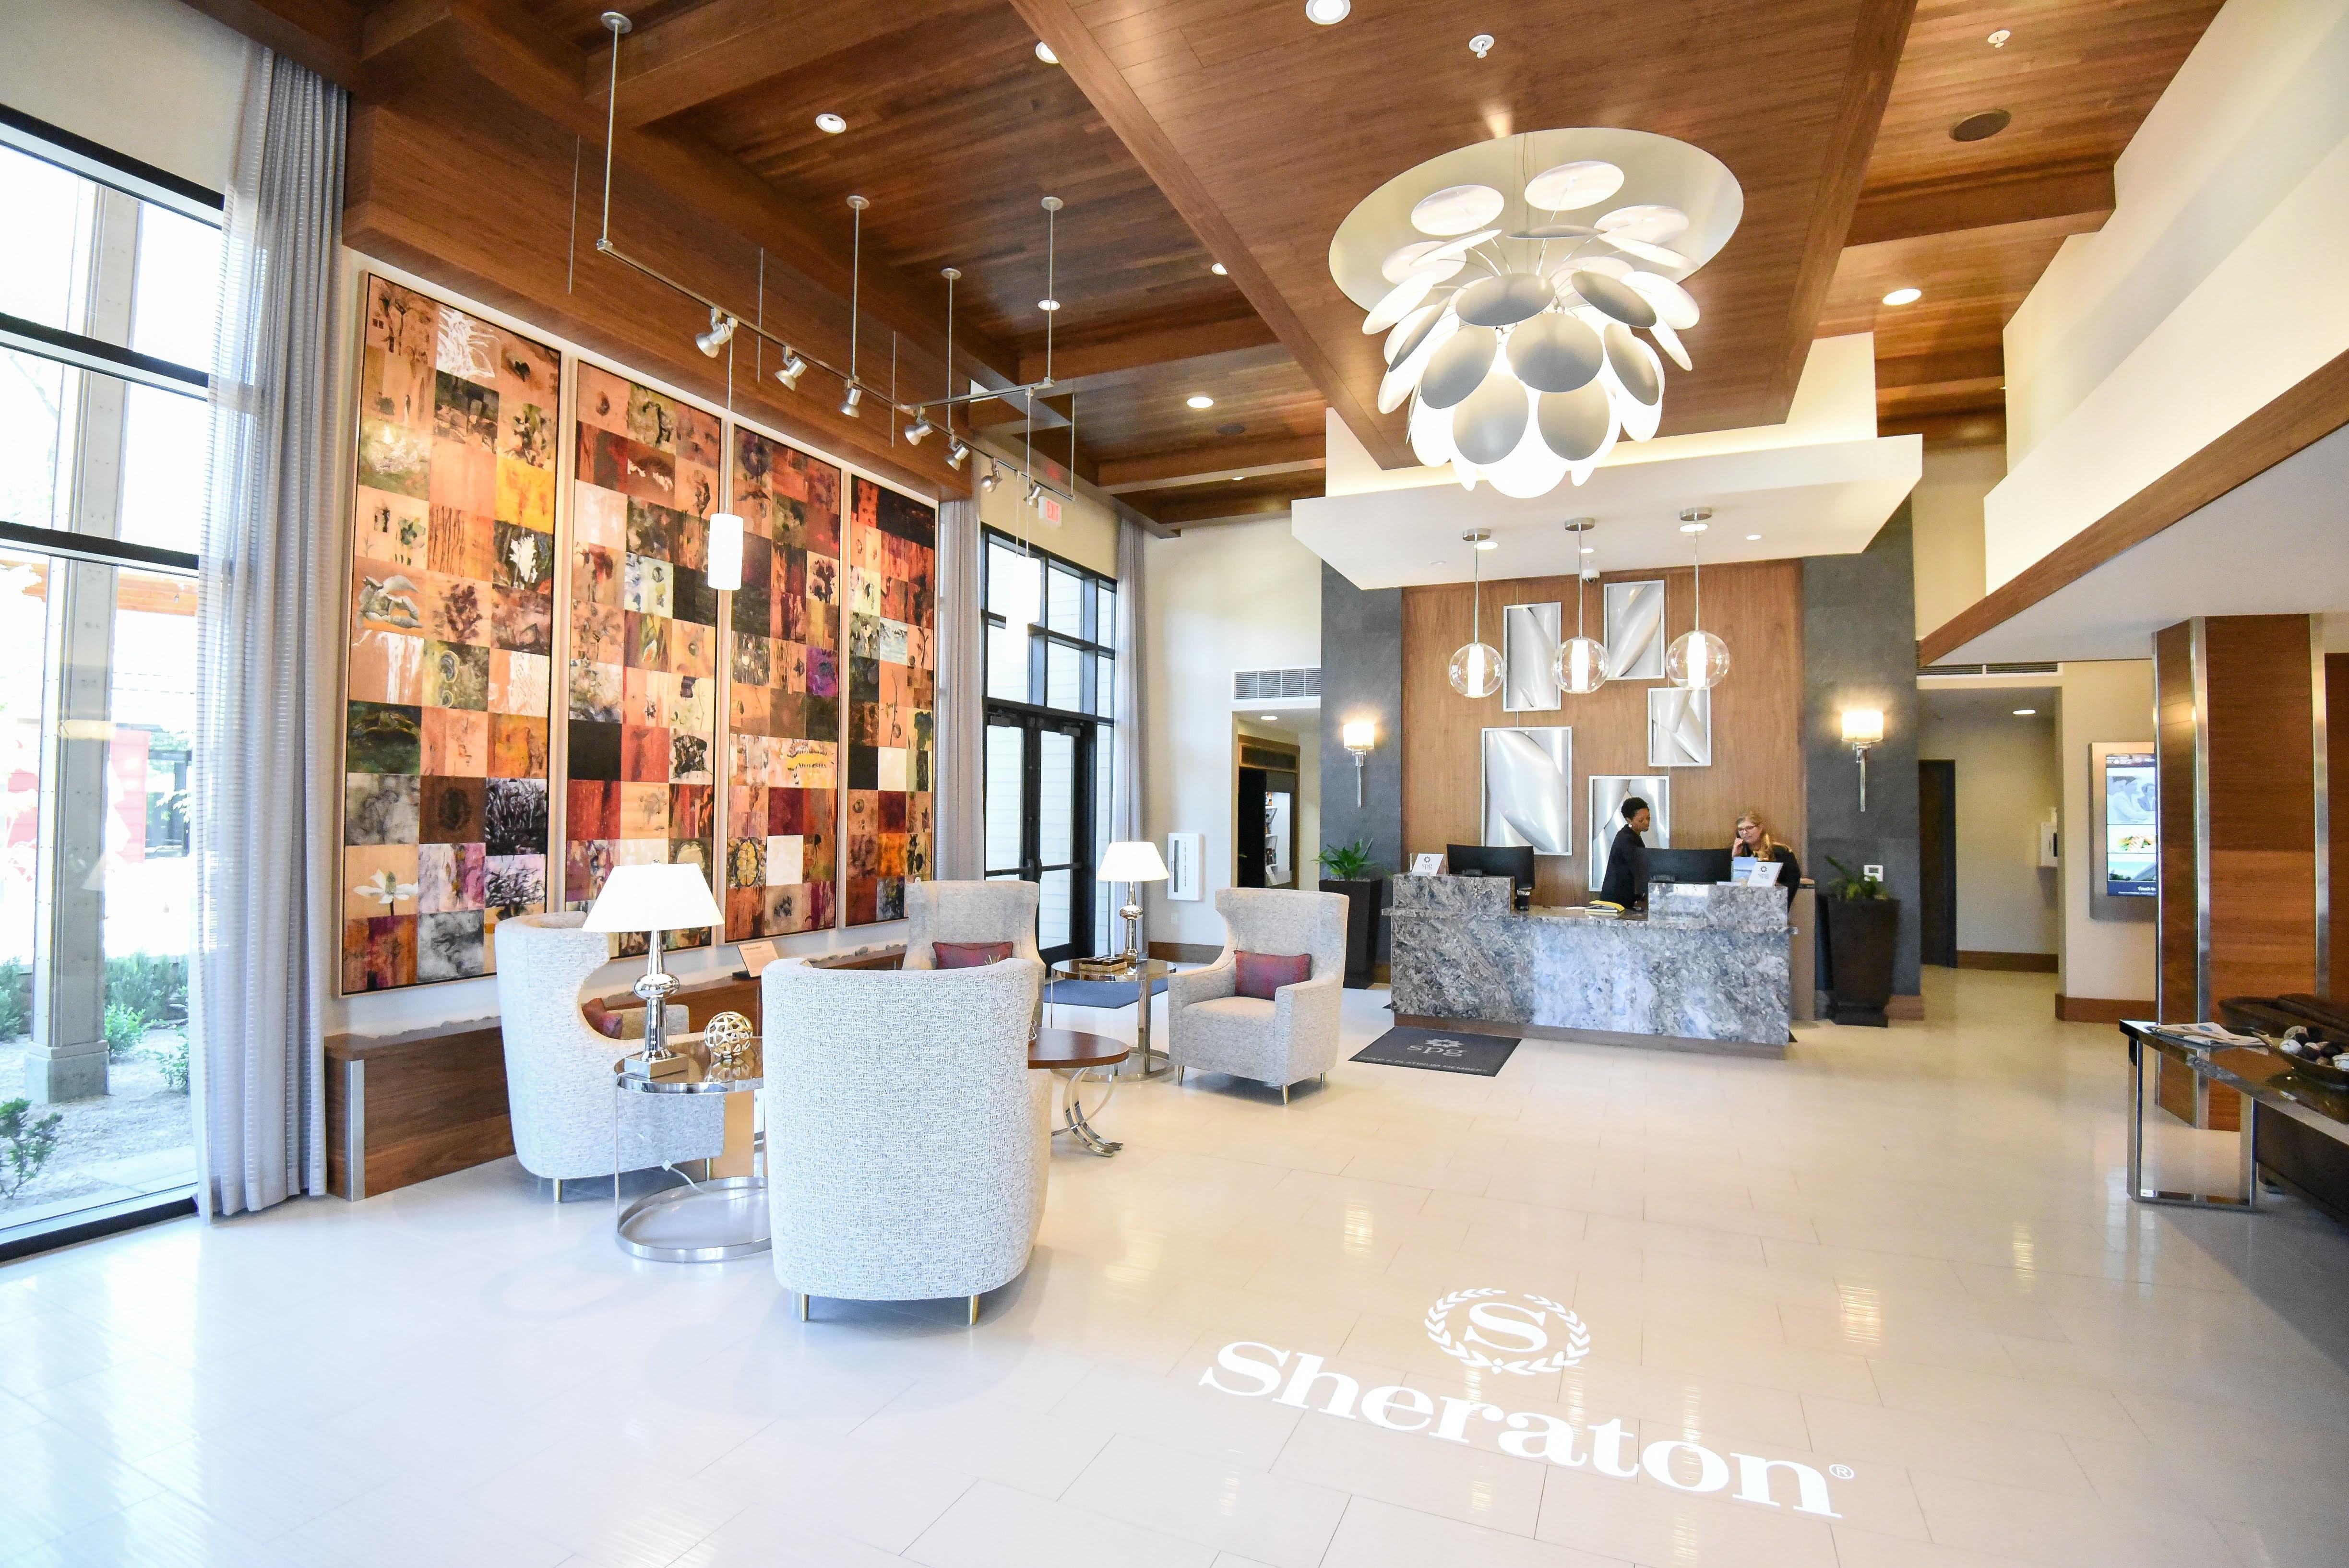 Sheraton-Redding-Hotel-lobby.jpg?mtime=20180615070726#asset:102132